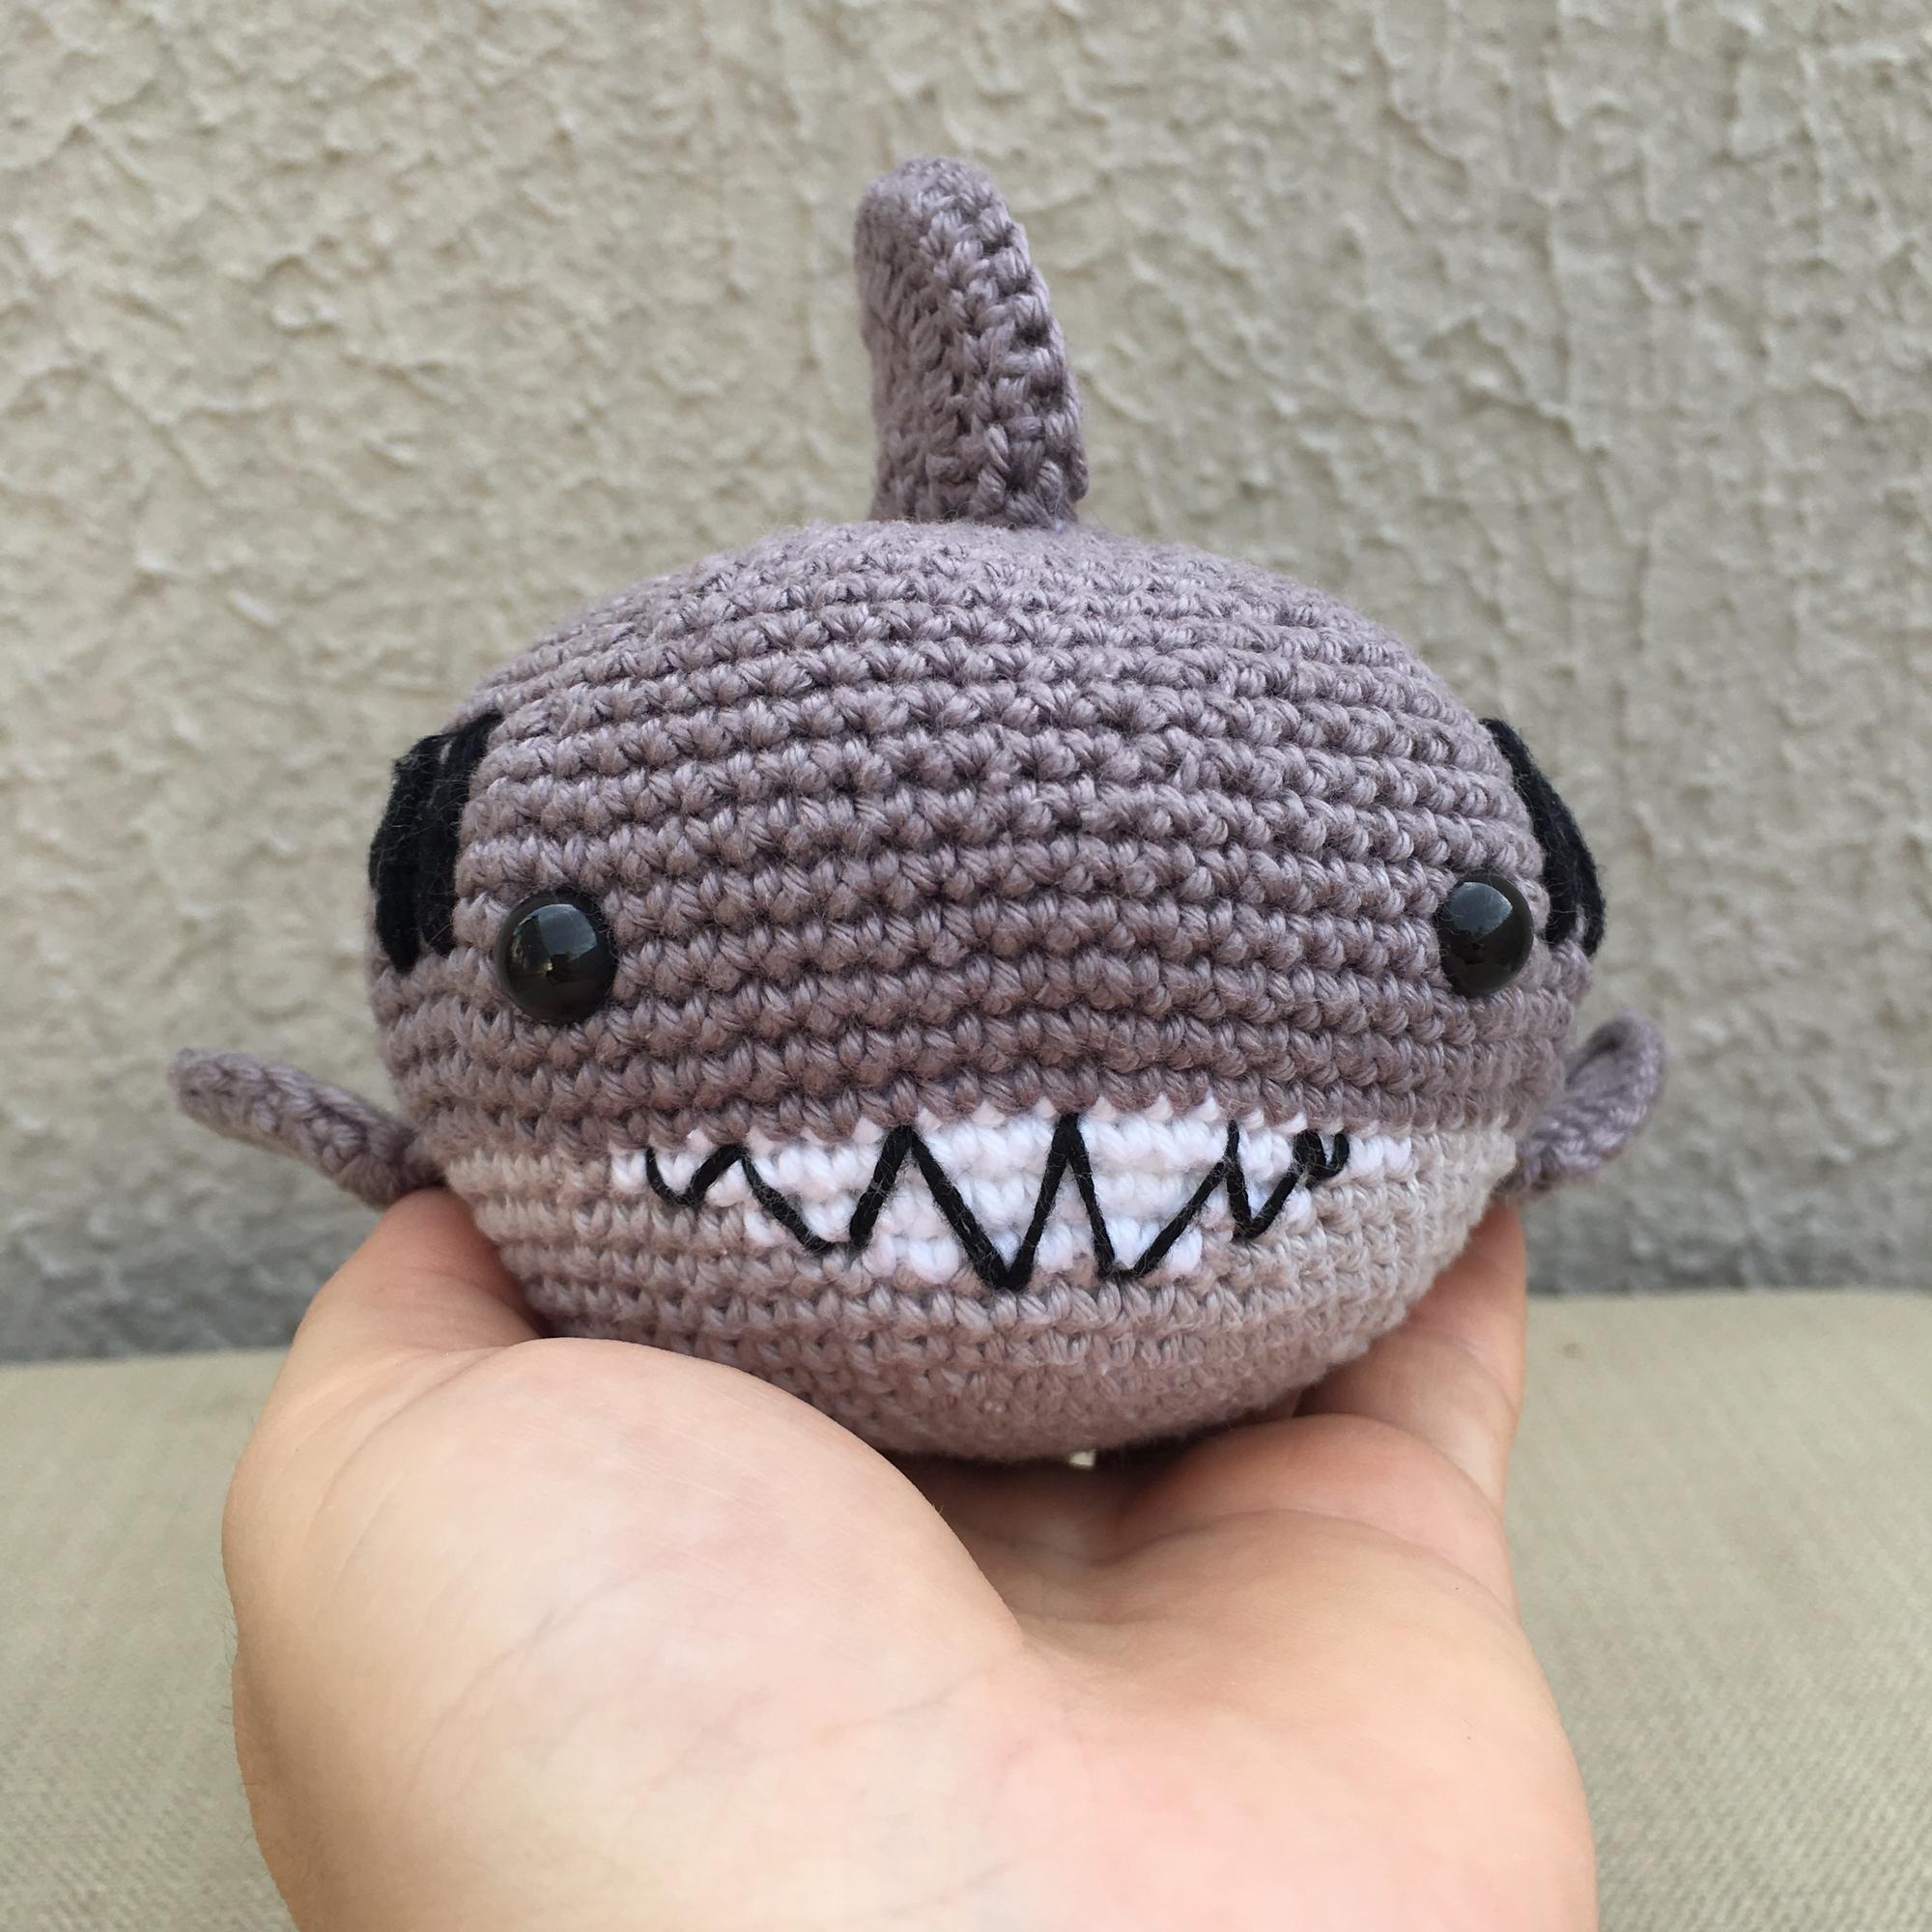 Tubarão amigurumi segunda parte - YouTube | Brinquedos de crochê ... | 2000x2000